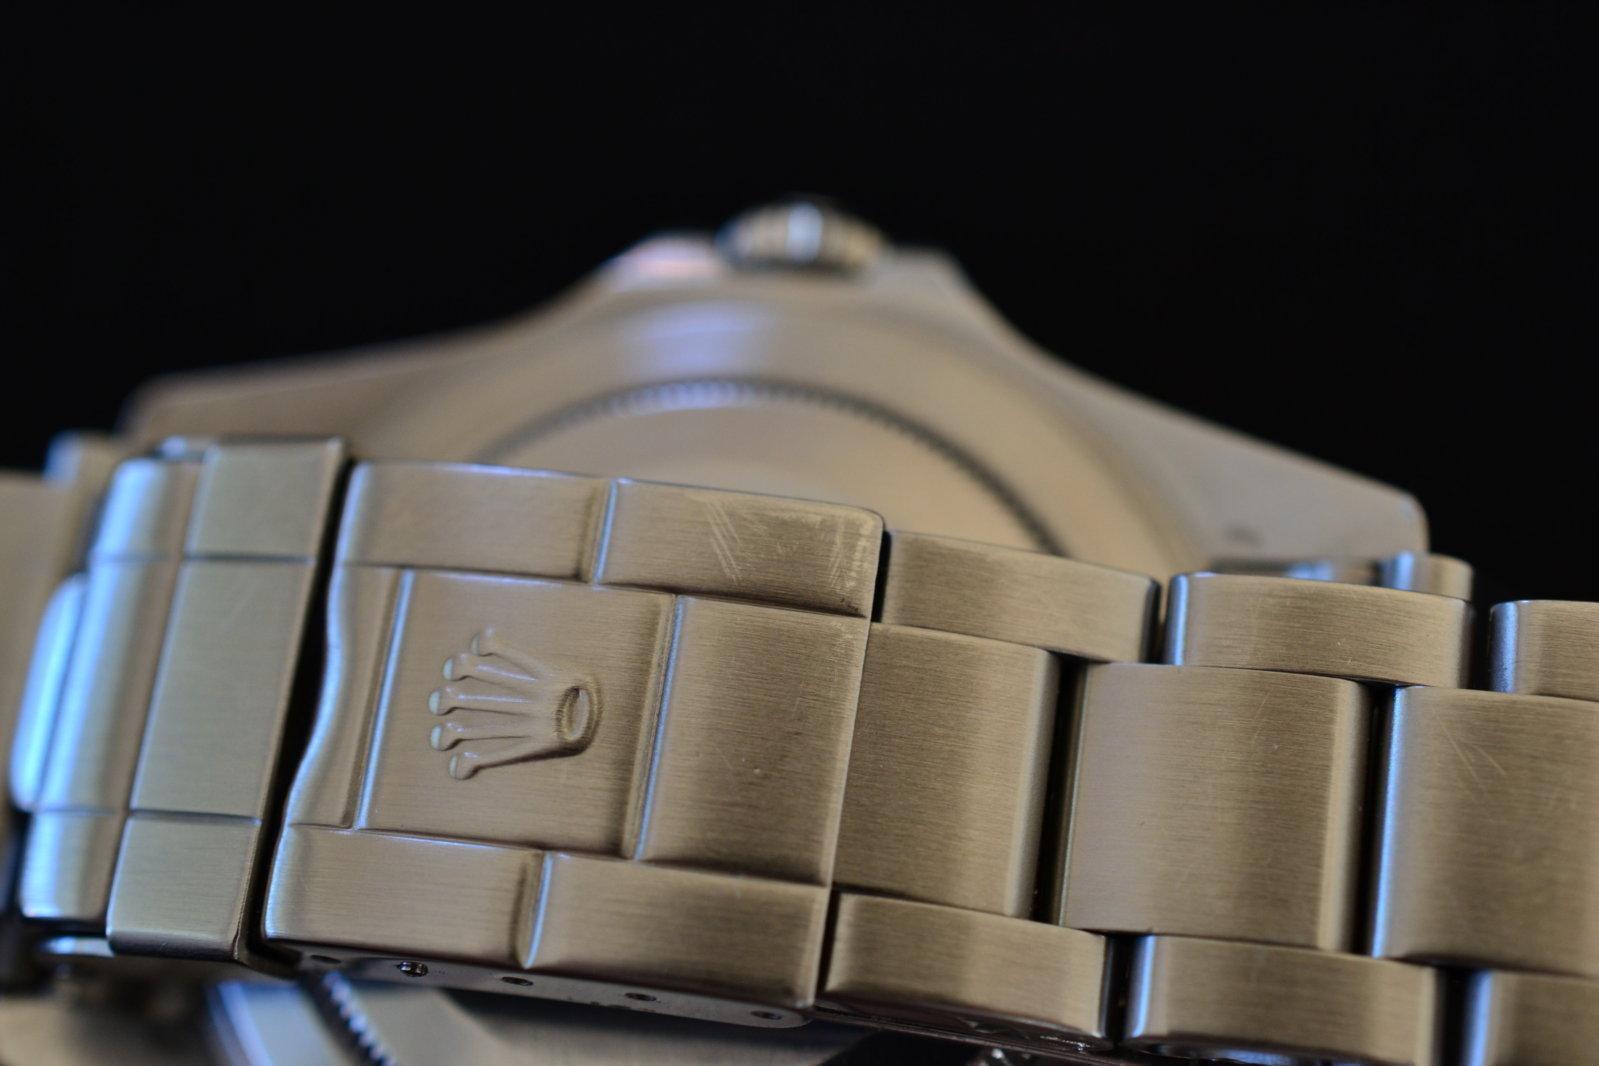 GMT baksida fokus repa.JPG